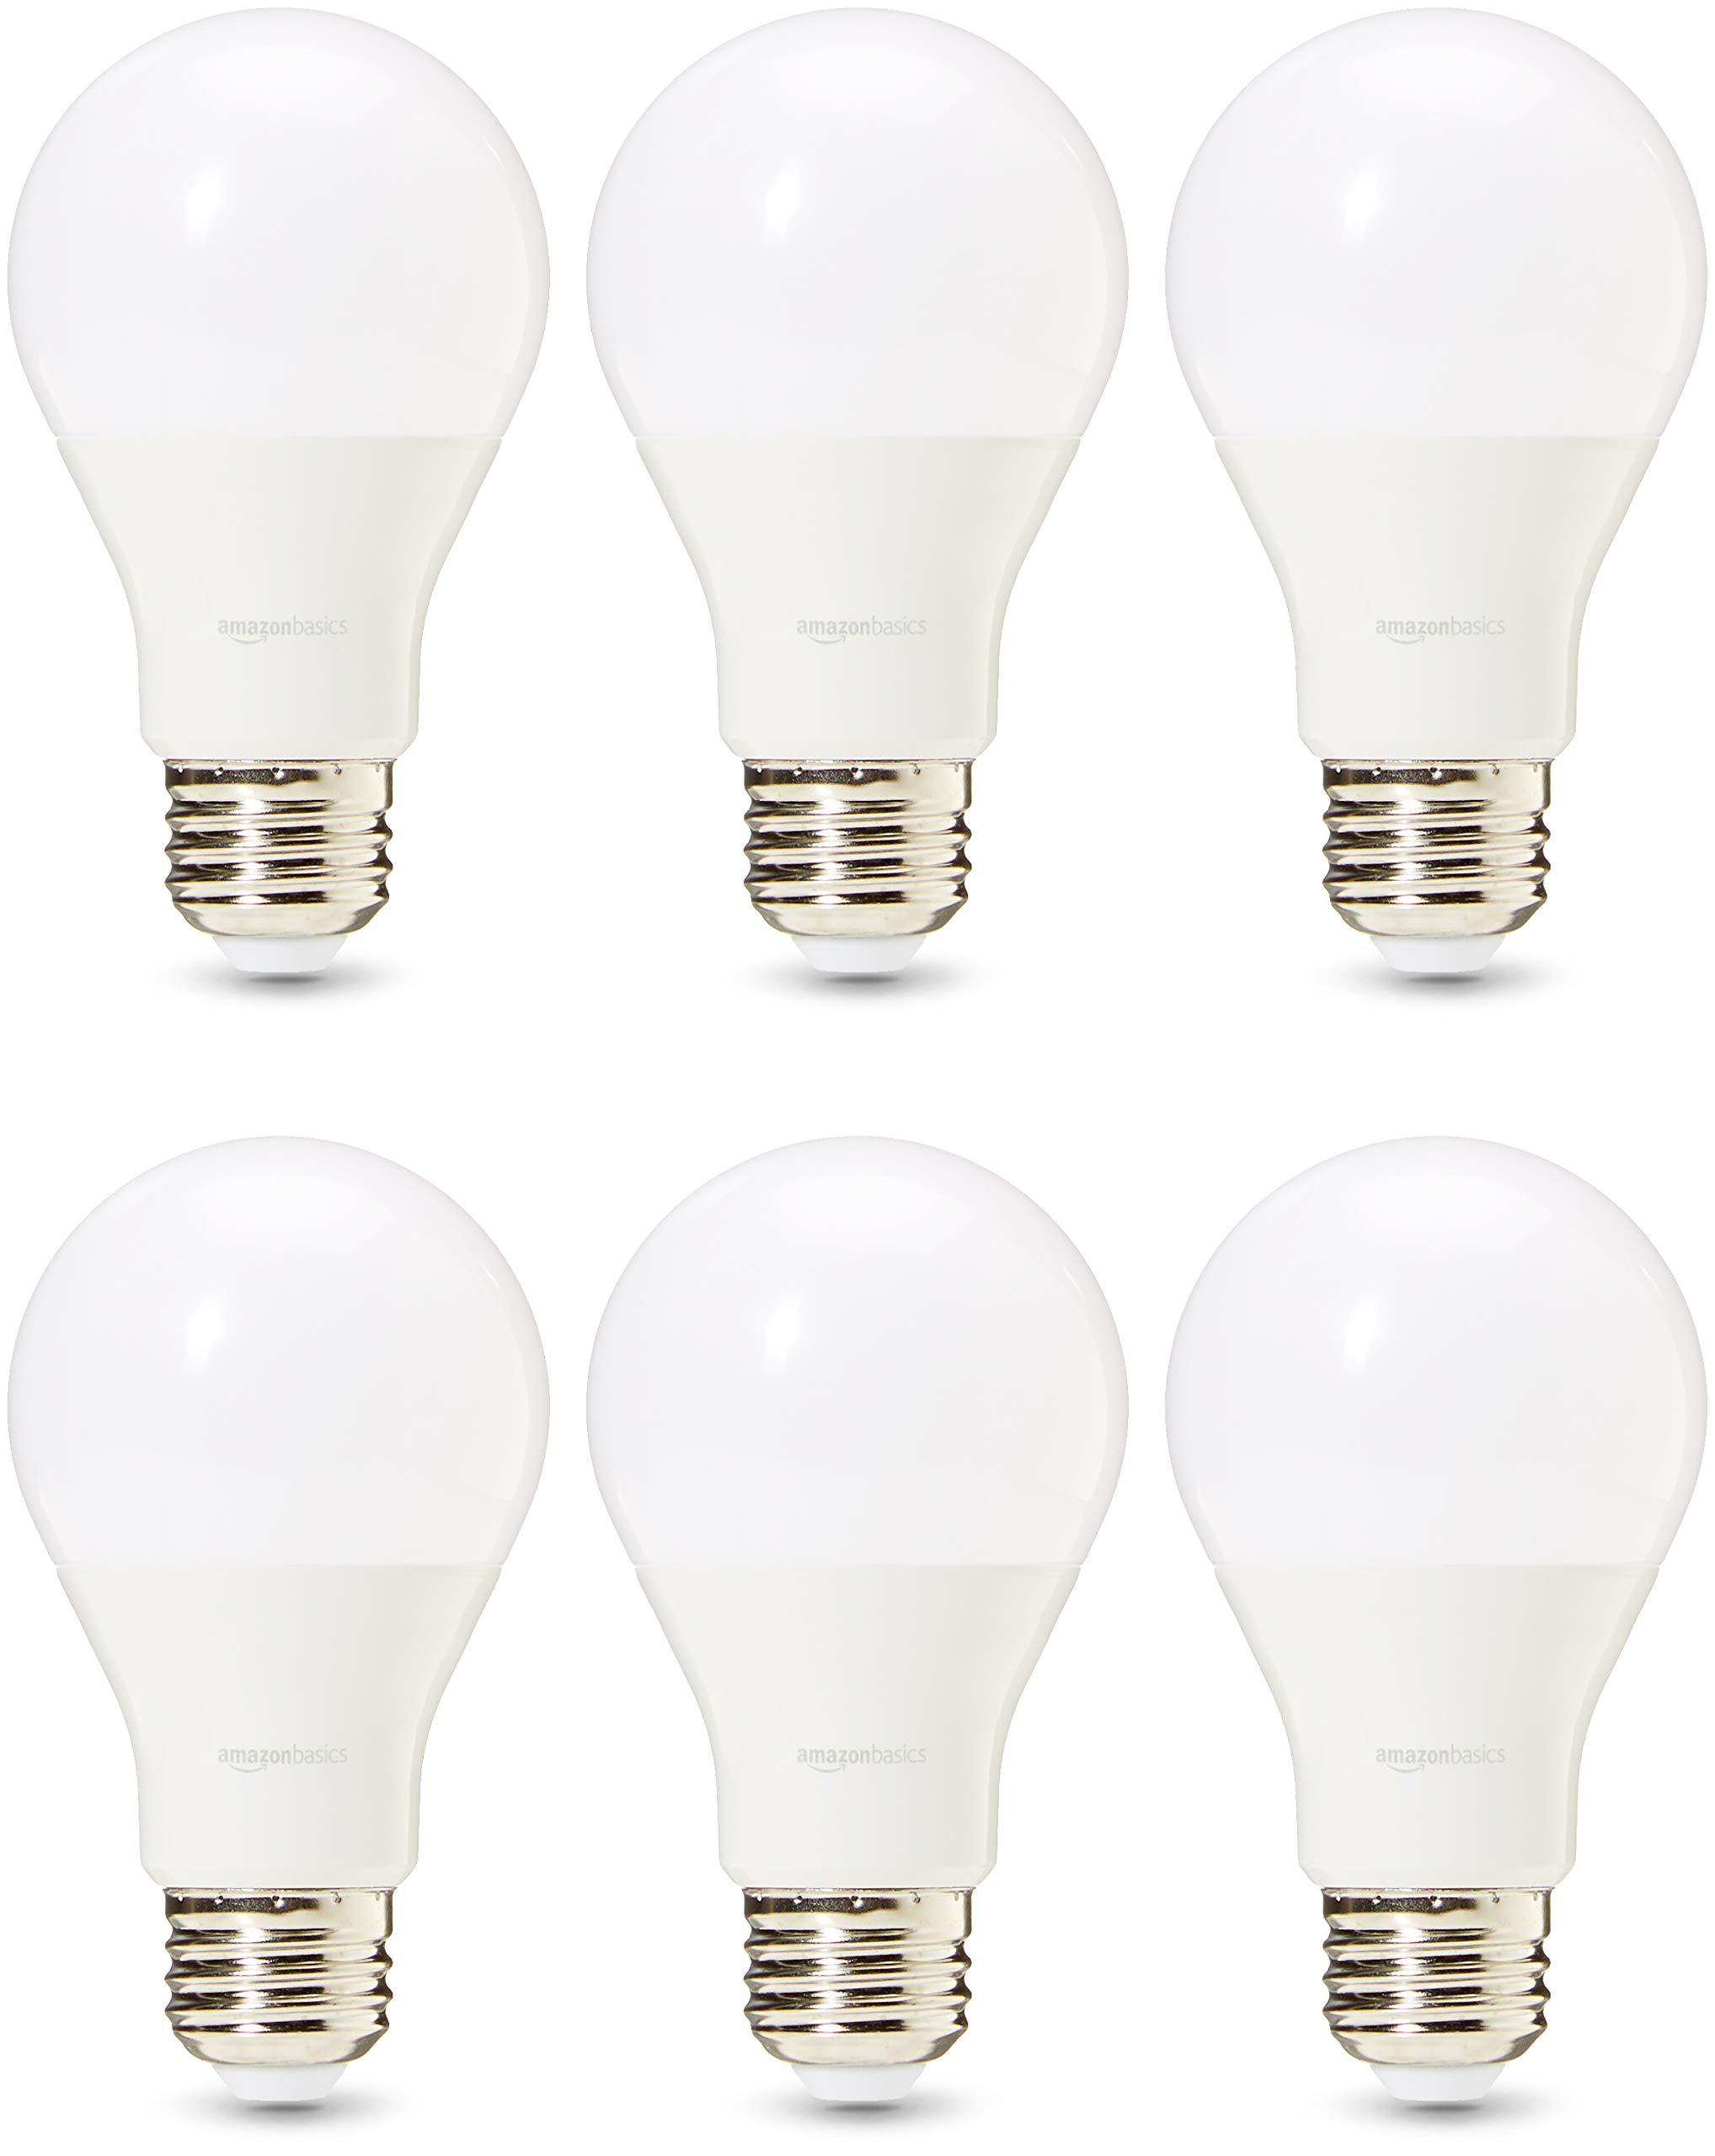 AmazonBasics 75 Watt 25,000 Hours Dimmable 1100 Lumens LED Light Bulb - Pack of 6, Daylight